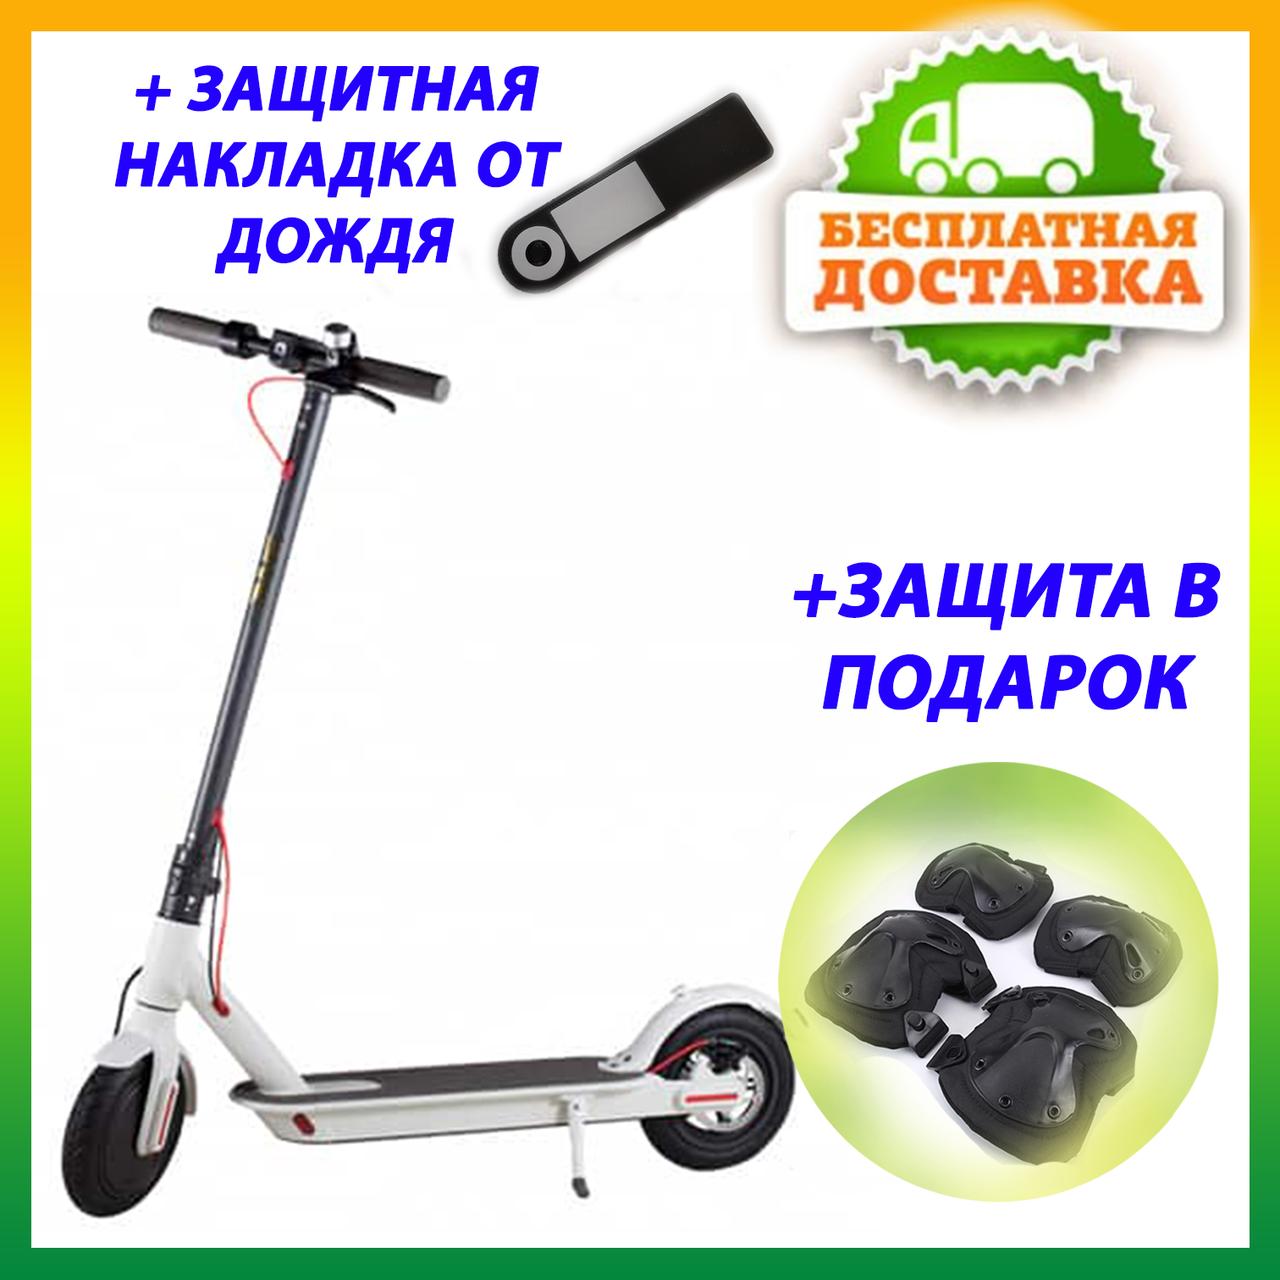 Электросамокат c приложением E-Scooter M365 Premium  (7,5Ah/350W)  Белый Елетросамокат